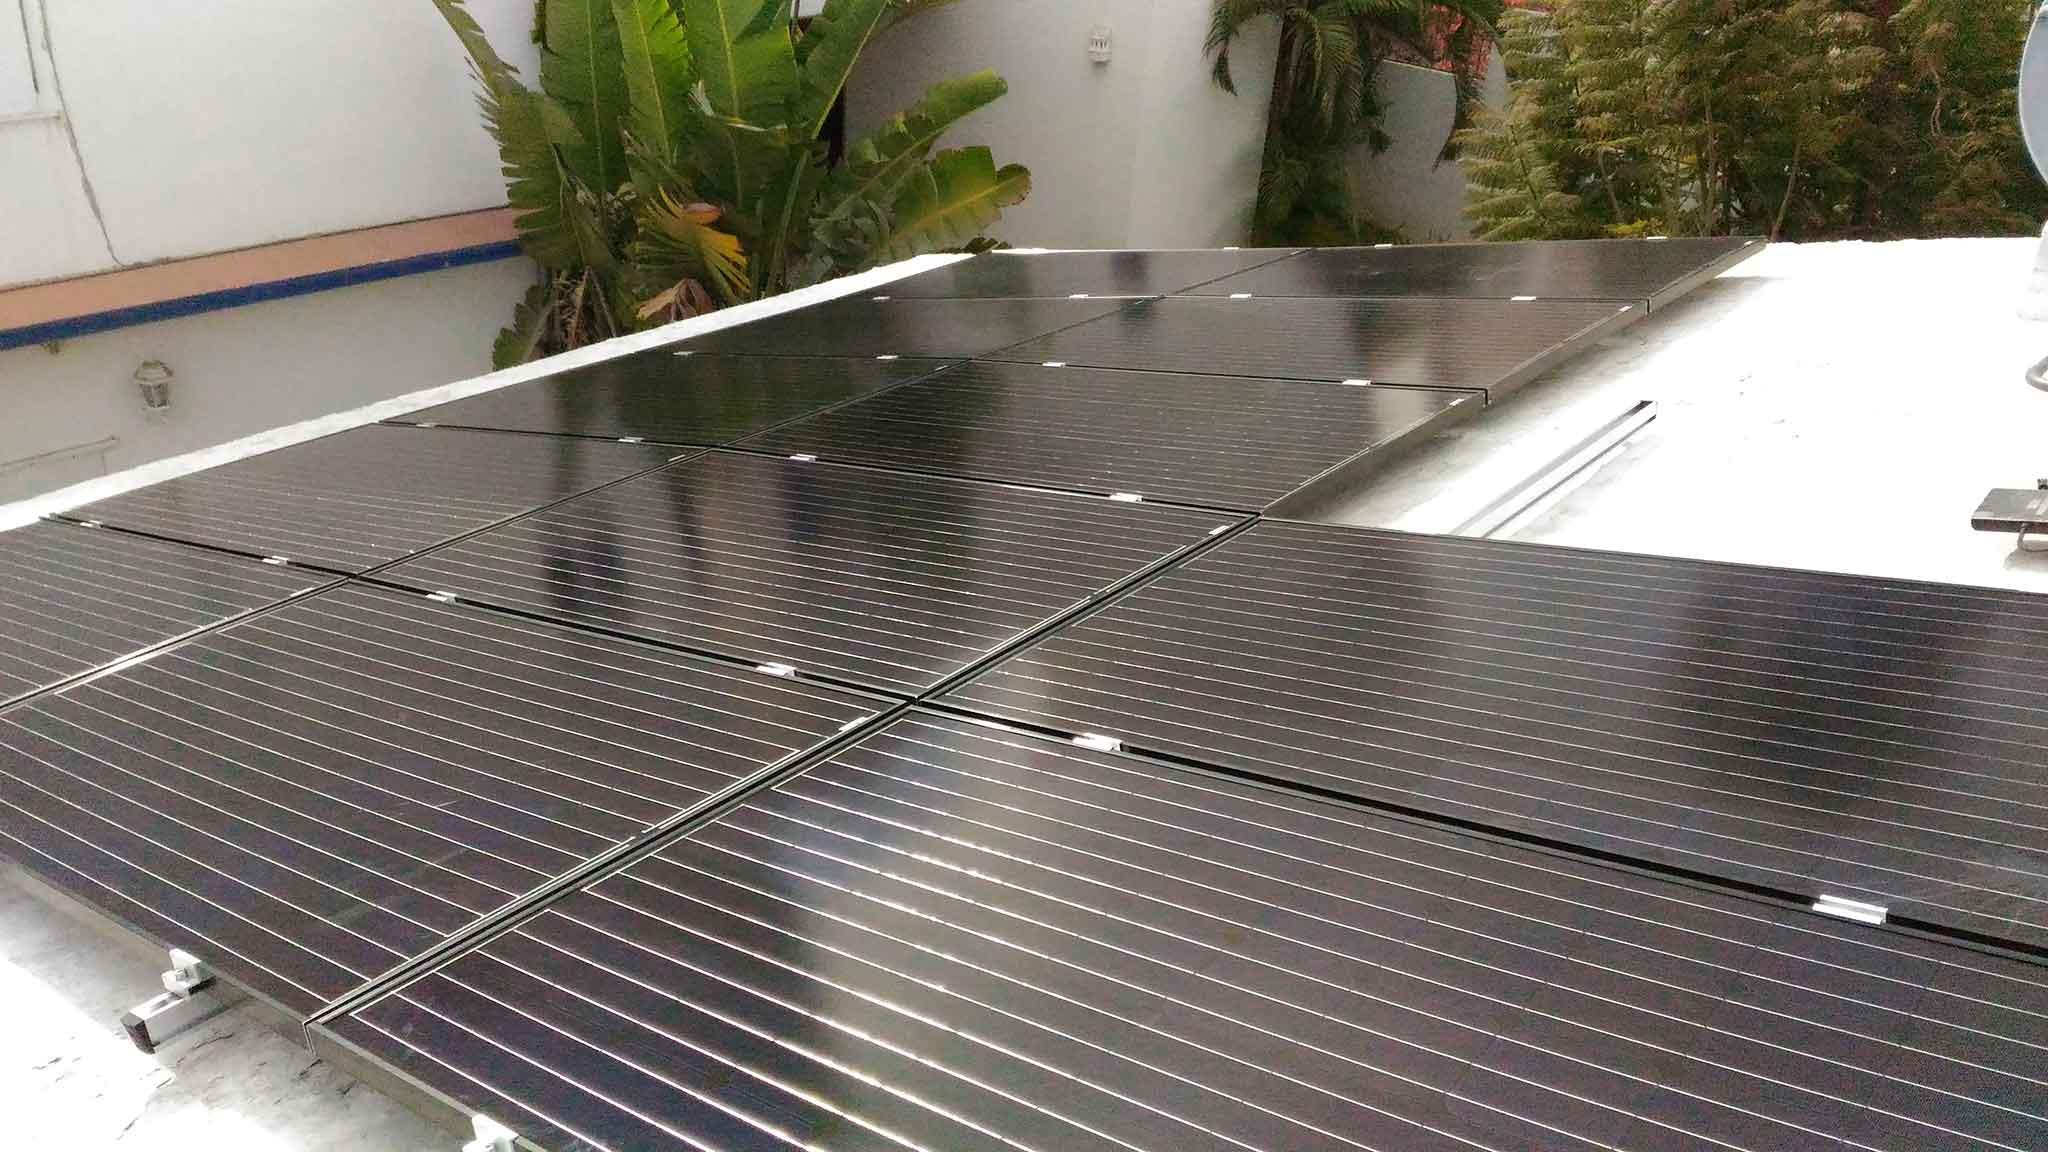 13 solar panels San Jose del Cabo